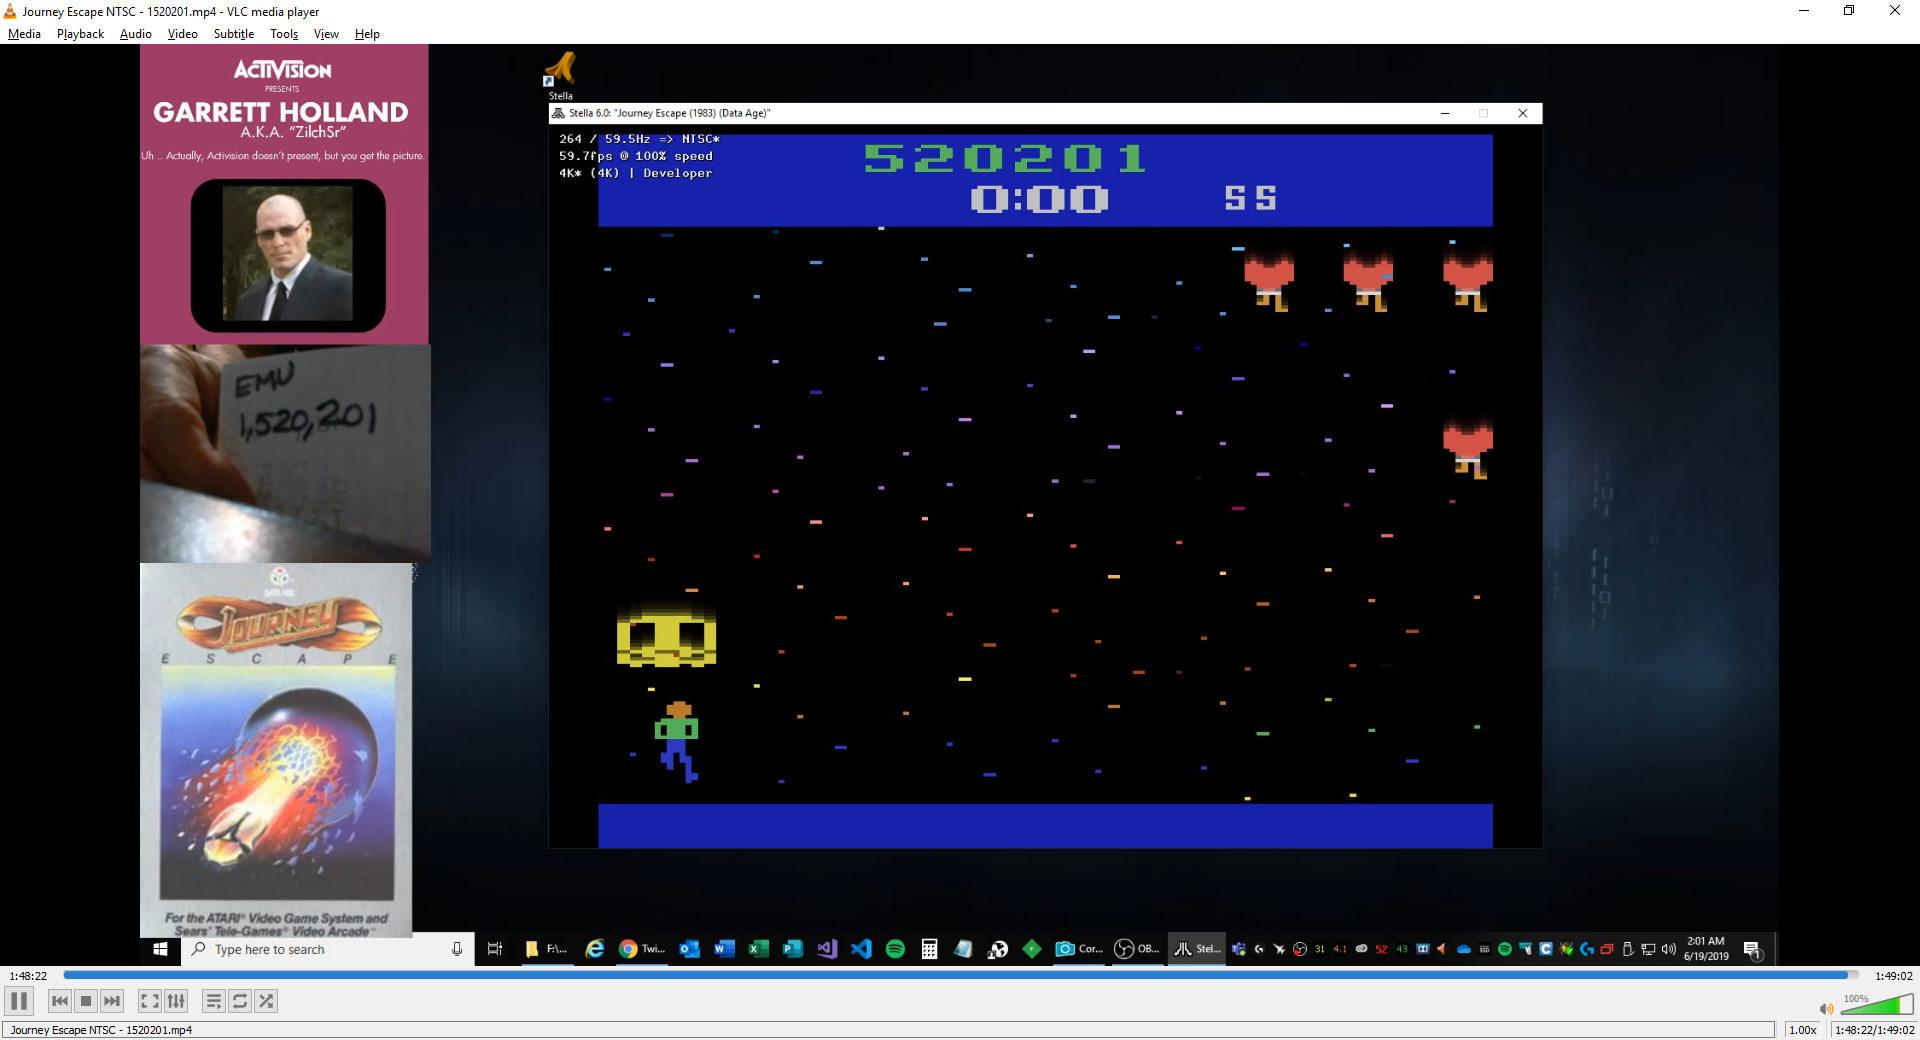 ZilchSr: Journey Escape (Atari 2600 Emulated Novice/B Mode) 1,520,201 points on 2019-06-19 01:14:41